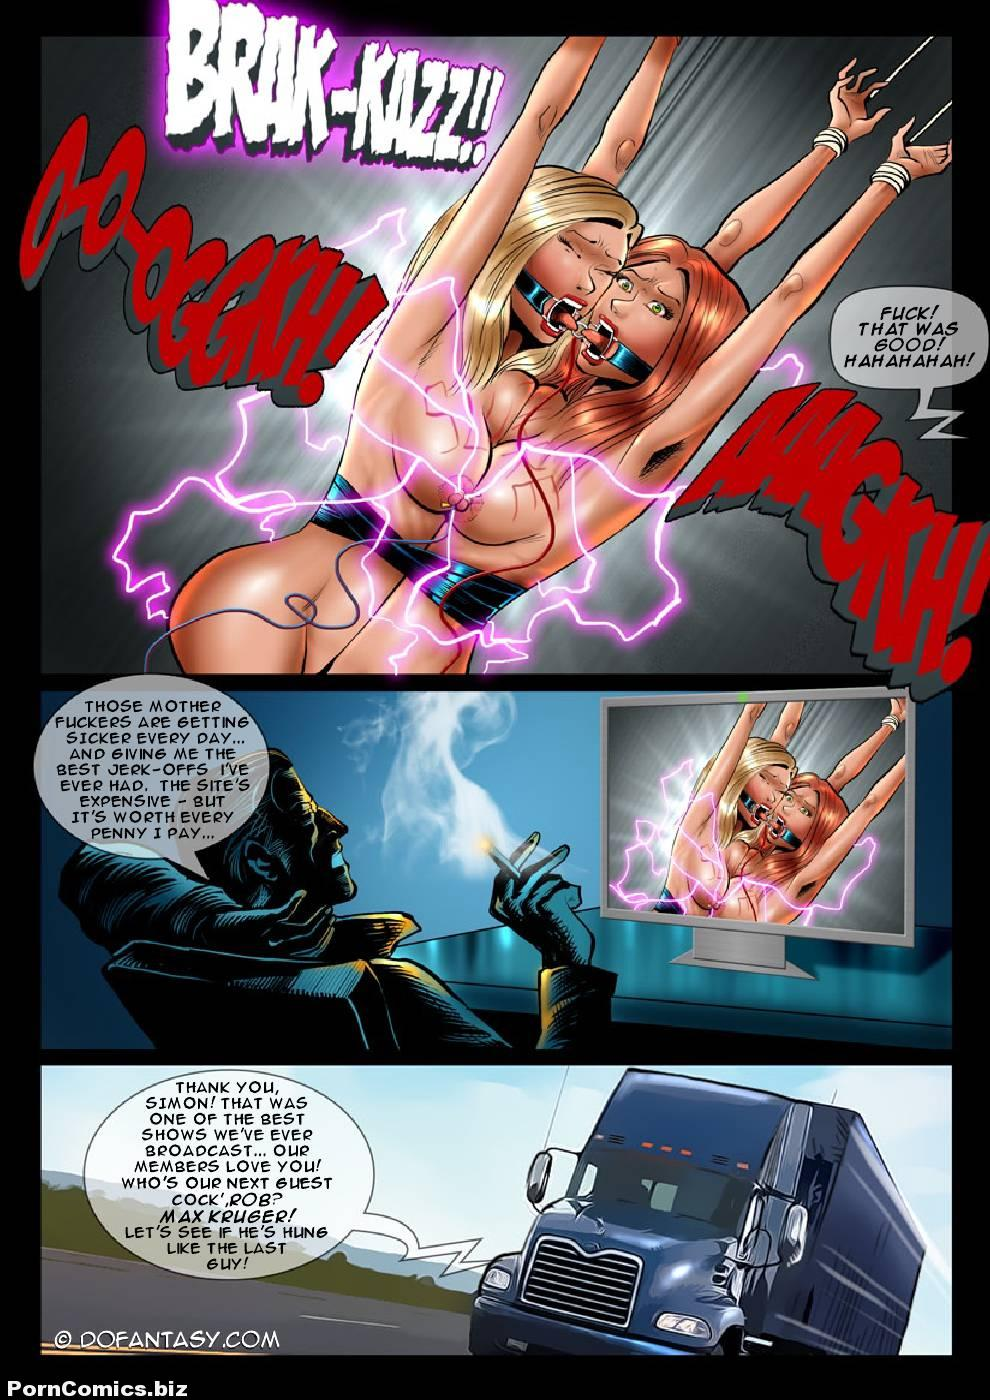 bsdmCAGRI-Mad Truck - part 3